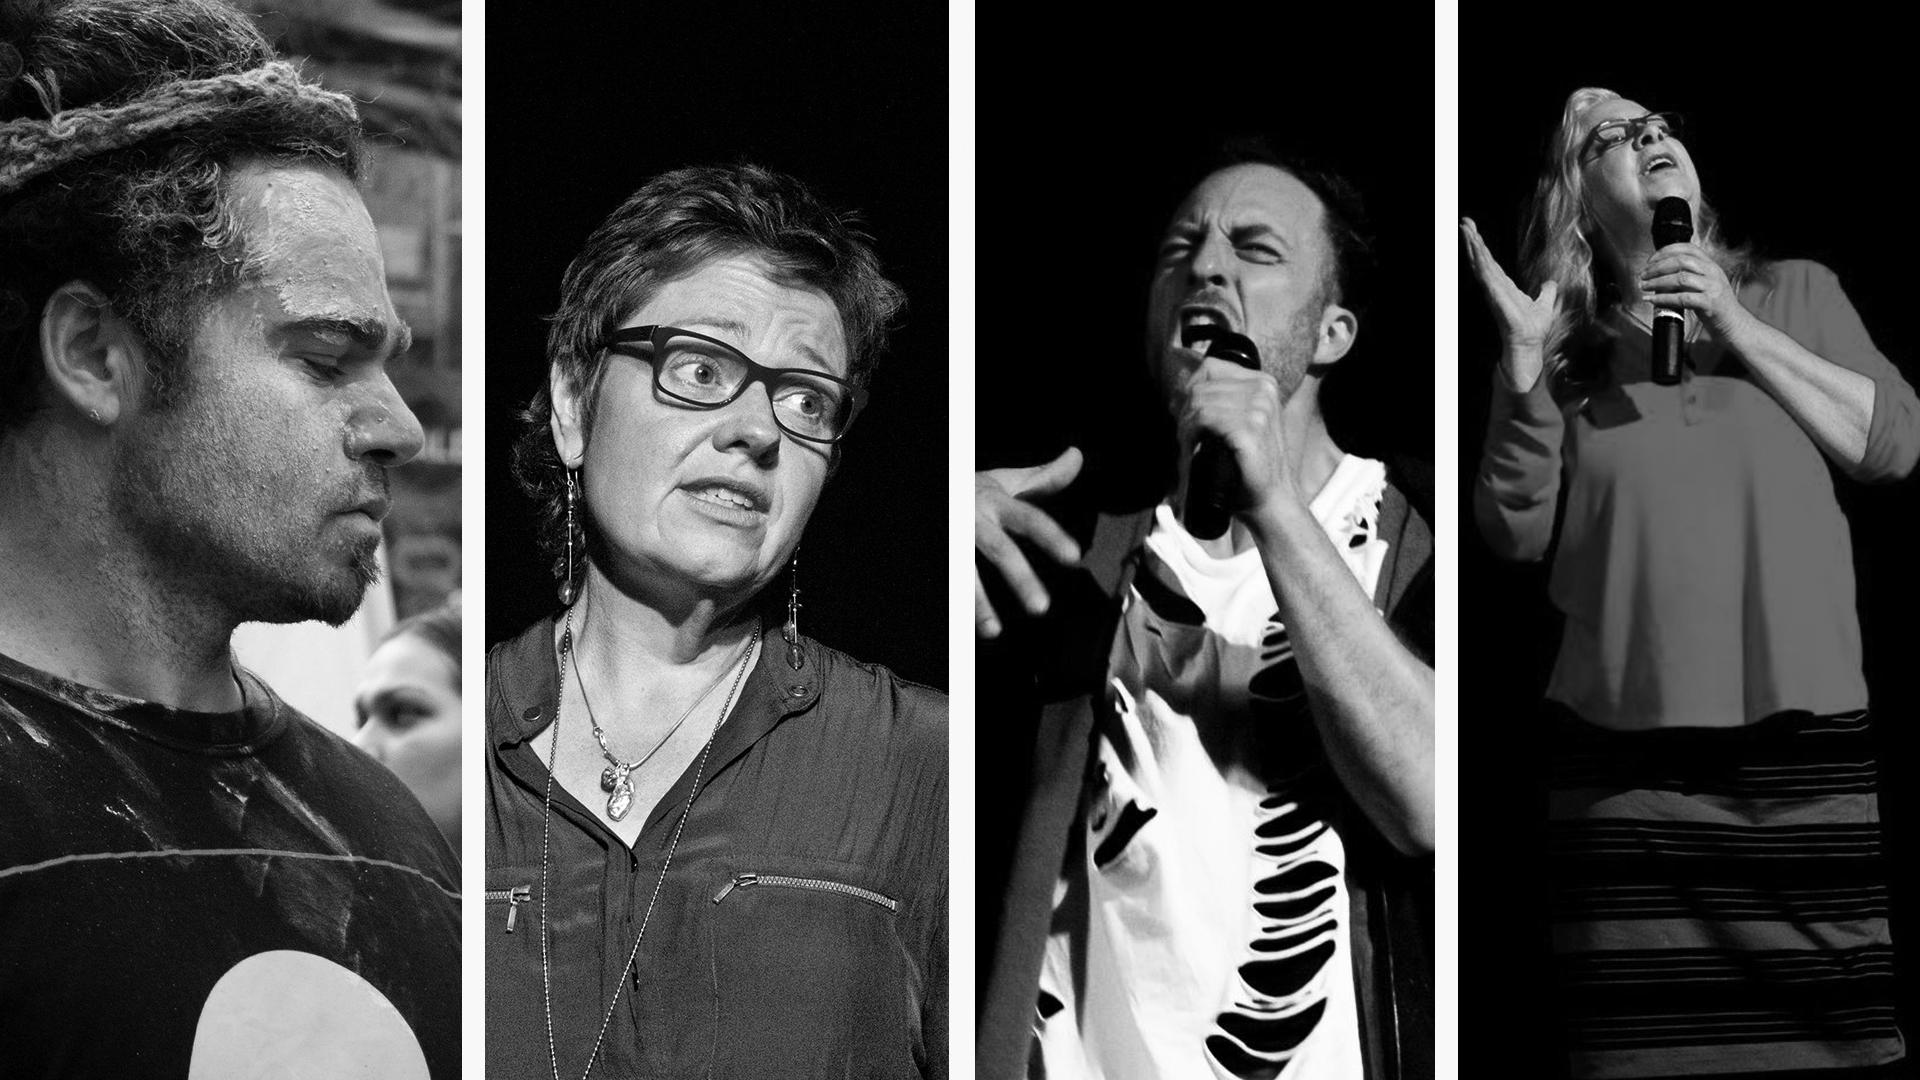 Montage: Neil Morris (musician), Kim Jeffs, Yoram Simons, Yvette Stubbs (poets)